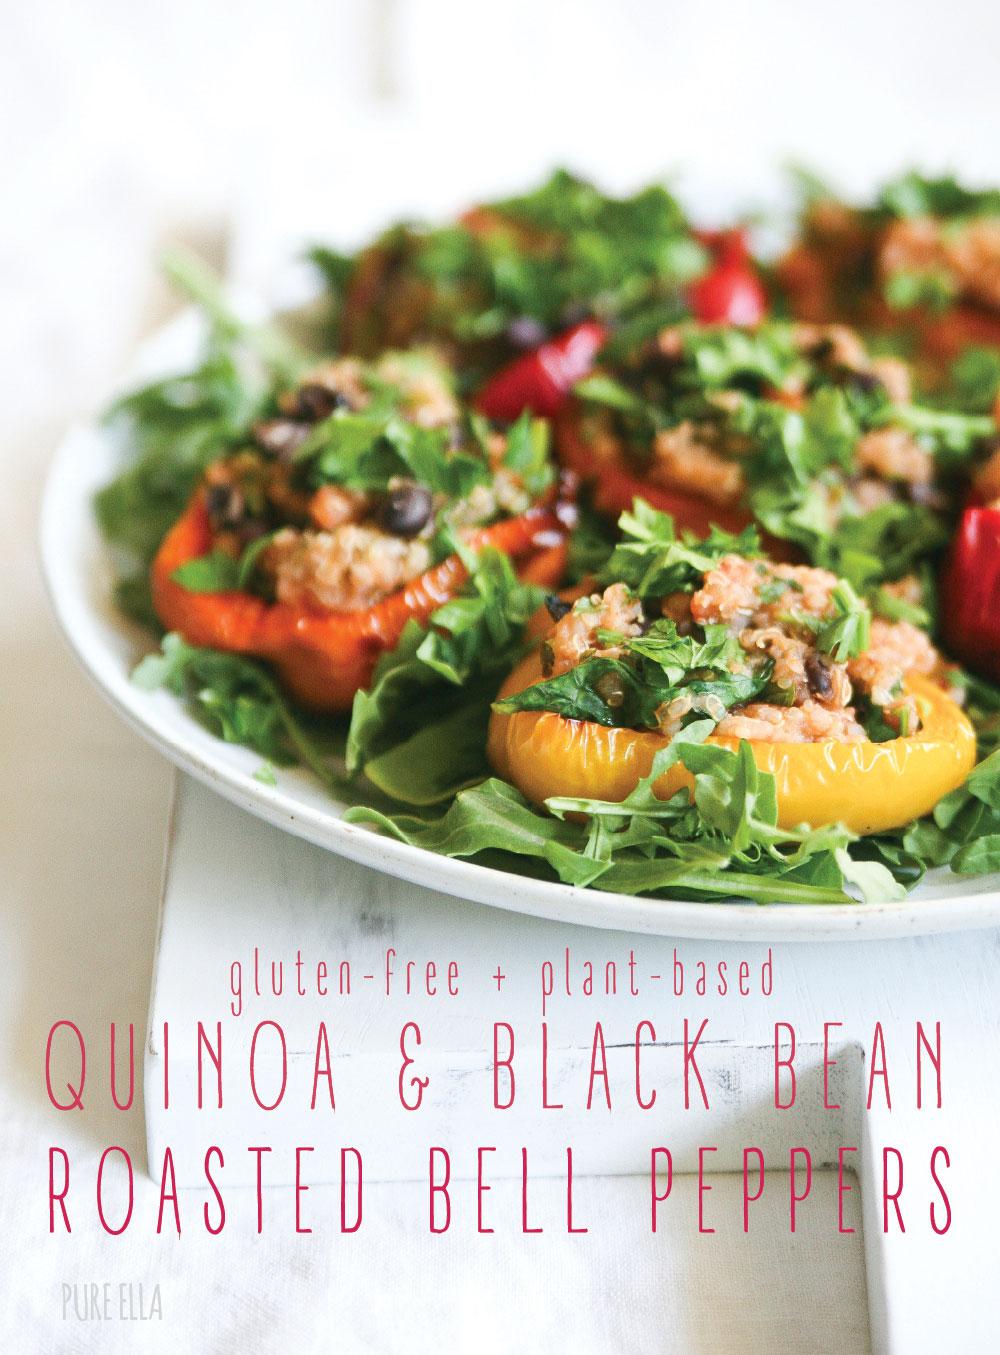 Pure-Ella-Gluten-free-Quinoa-Black-Bean-Roasted-Bell-Peppers